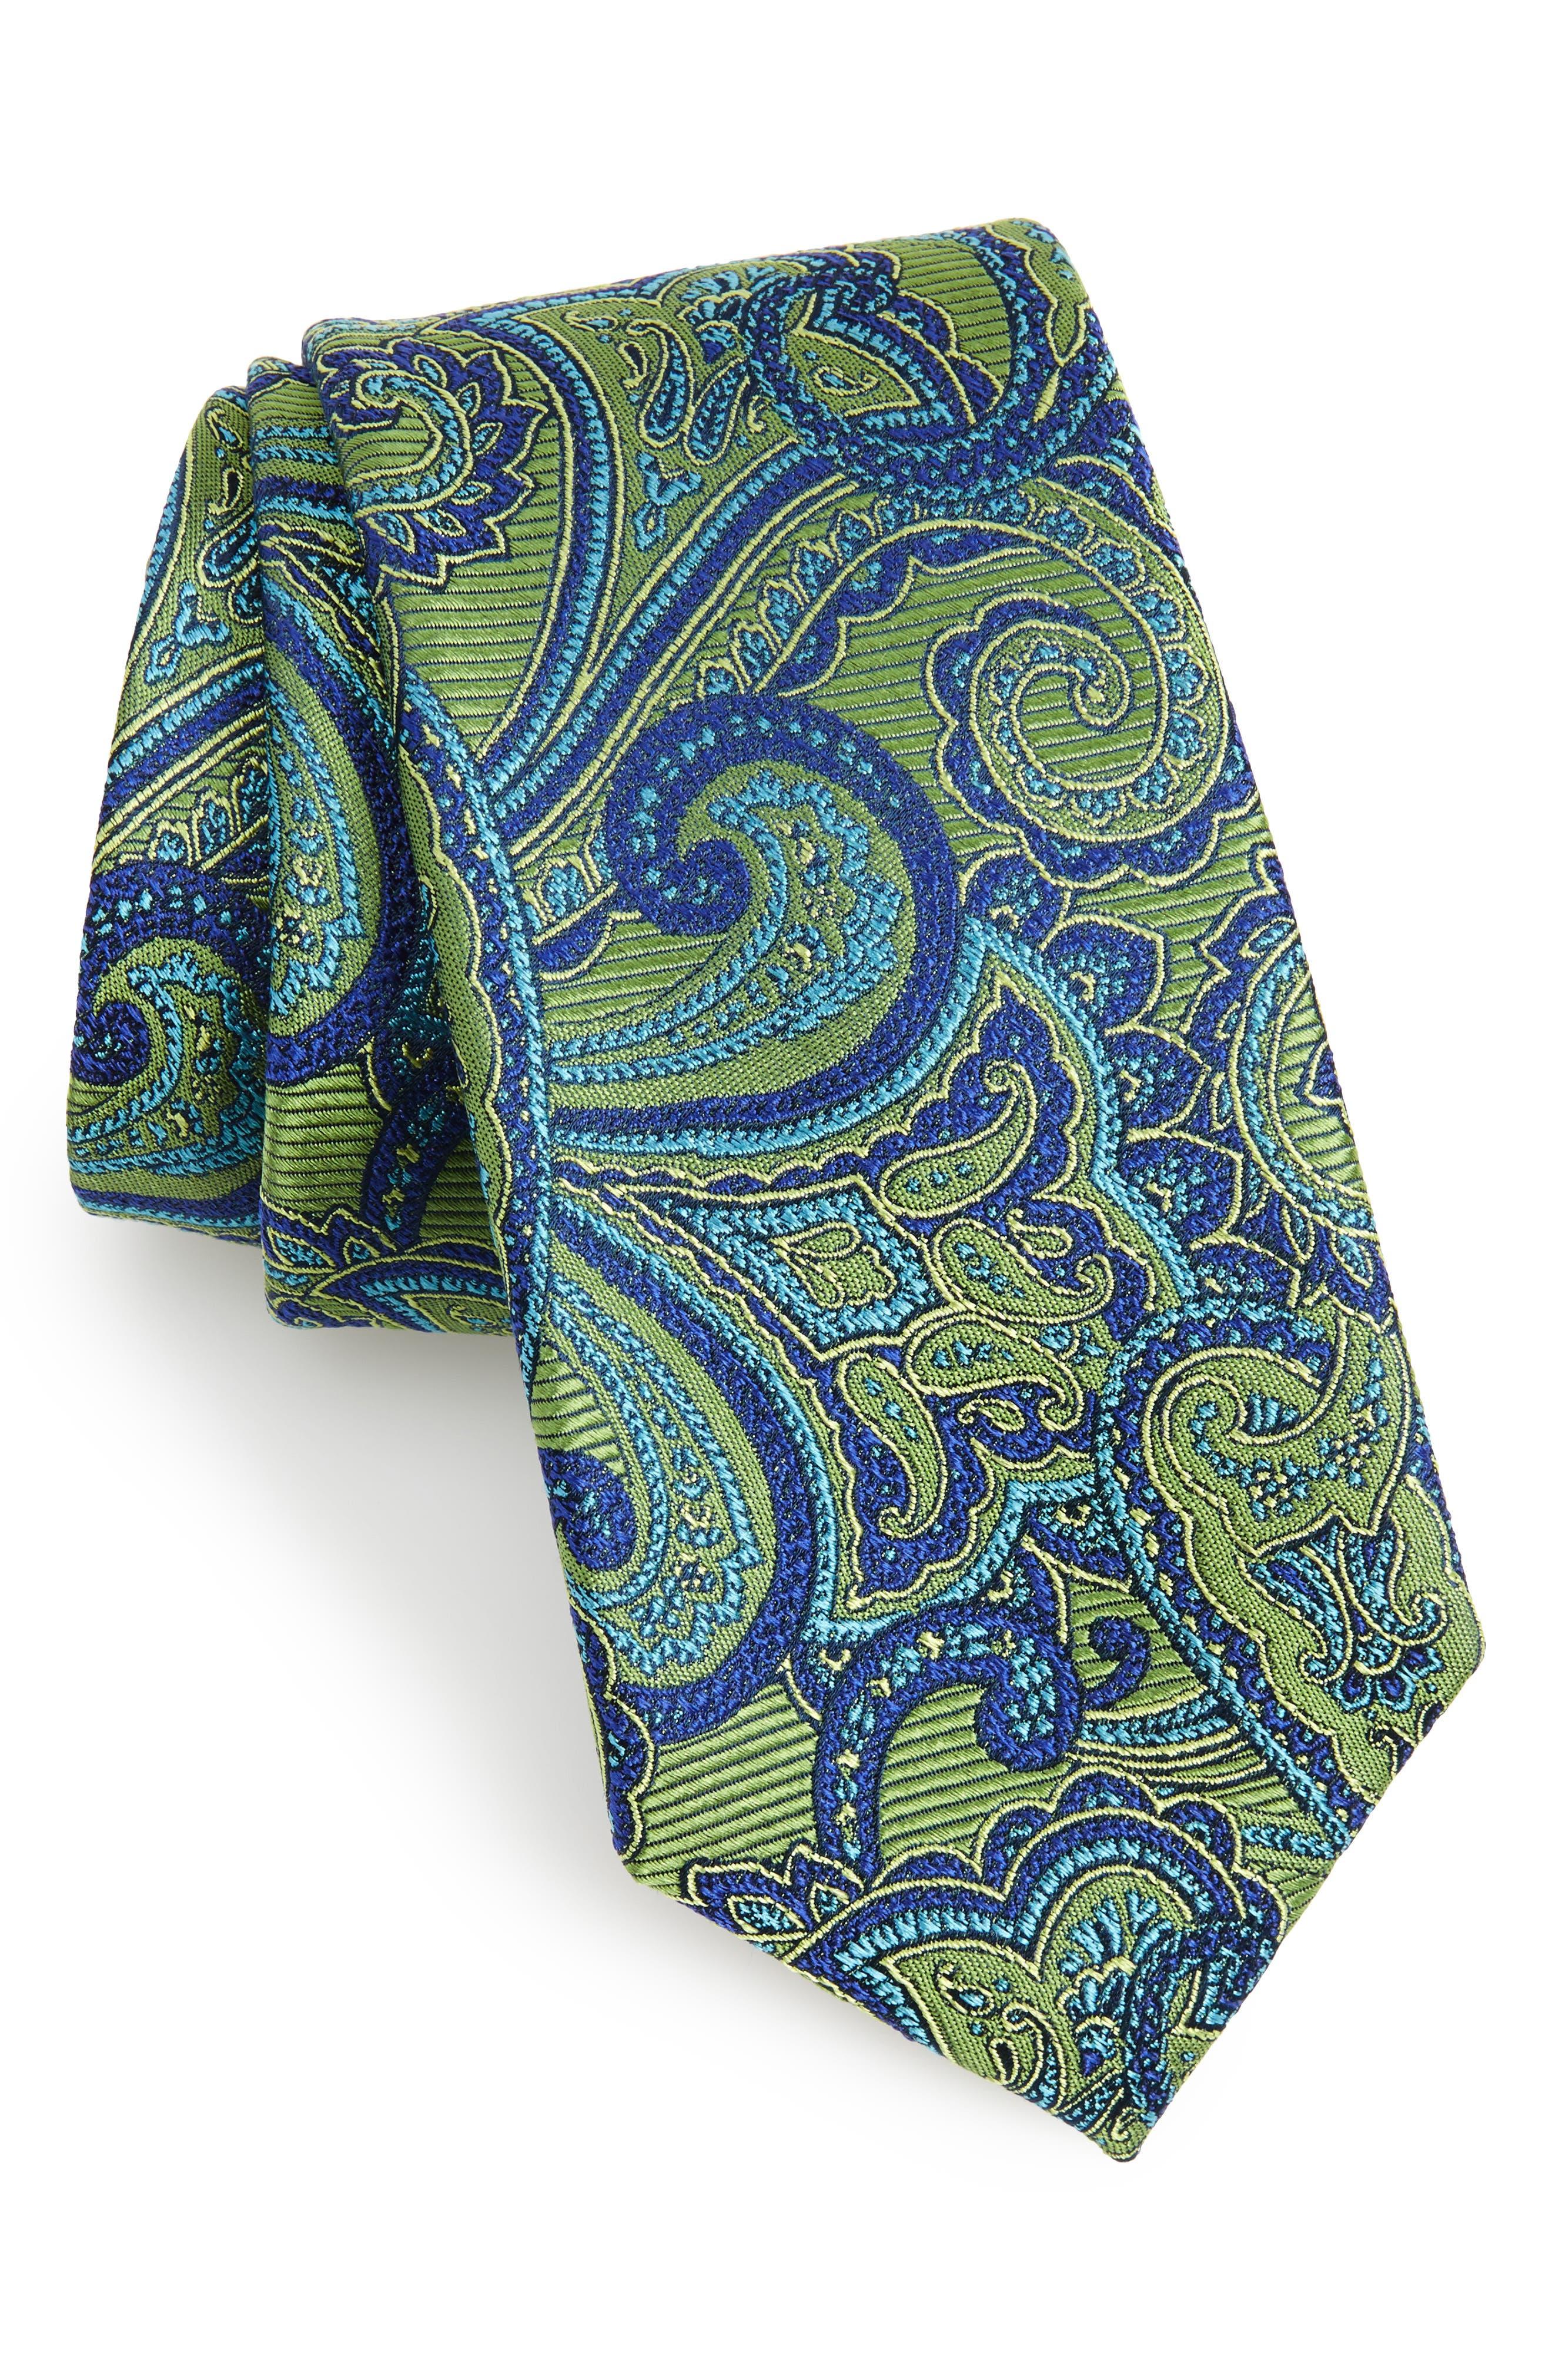 Alternate Image 1 Selected - Nordstrom Men's Shop Avalon Paisley Silk Tie